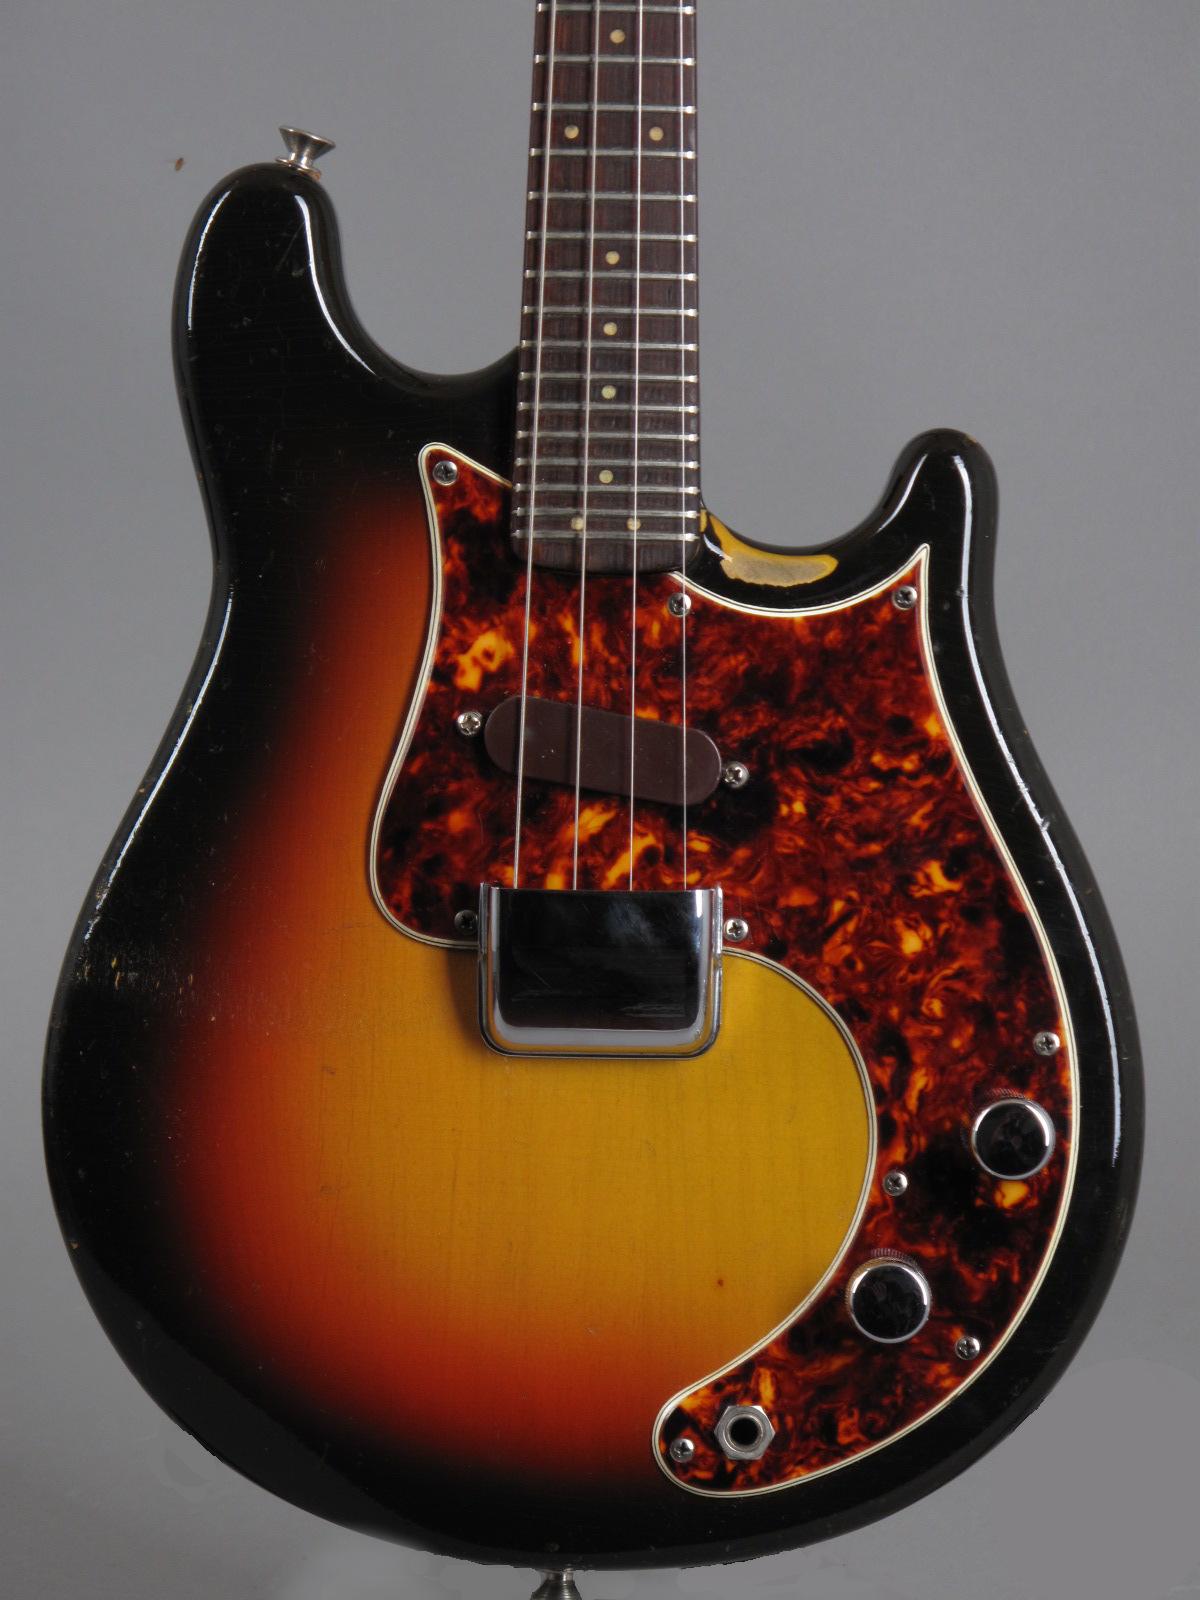 1966 Fender Electric Mandolin (Mandocaster)